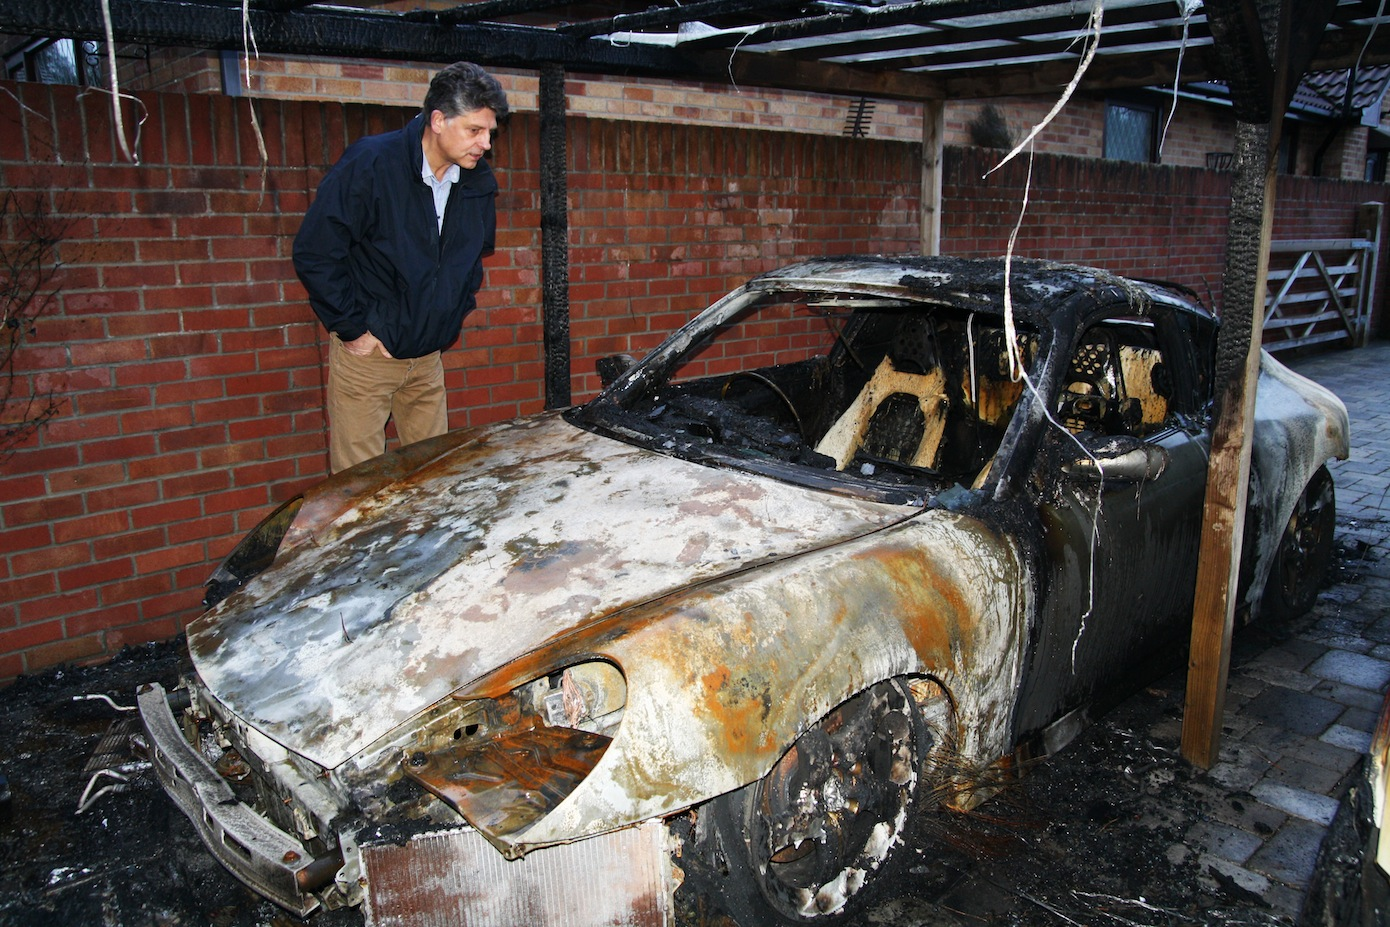 Andrew Towning's Porsche has been destroyed